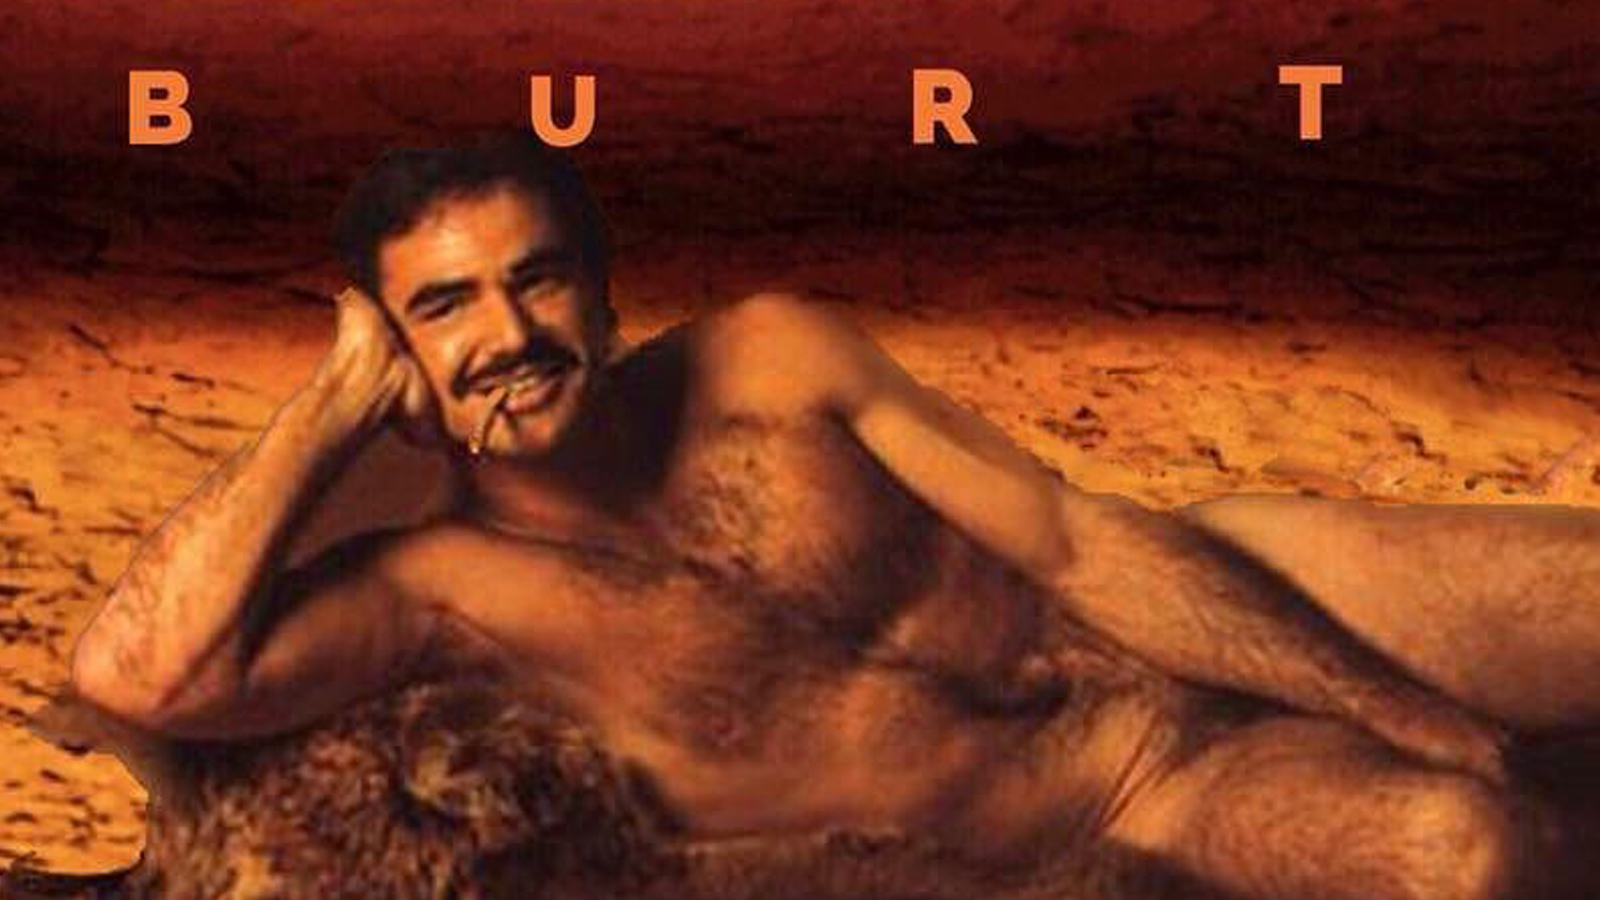 Chains Pay Tribute to Burt Reynolds